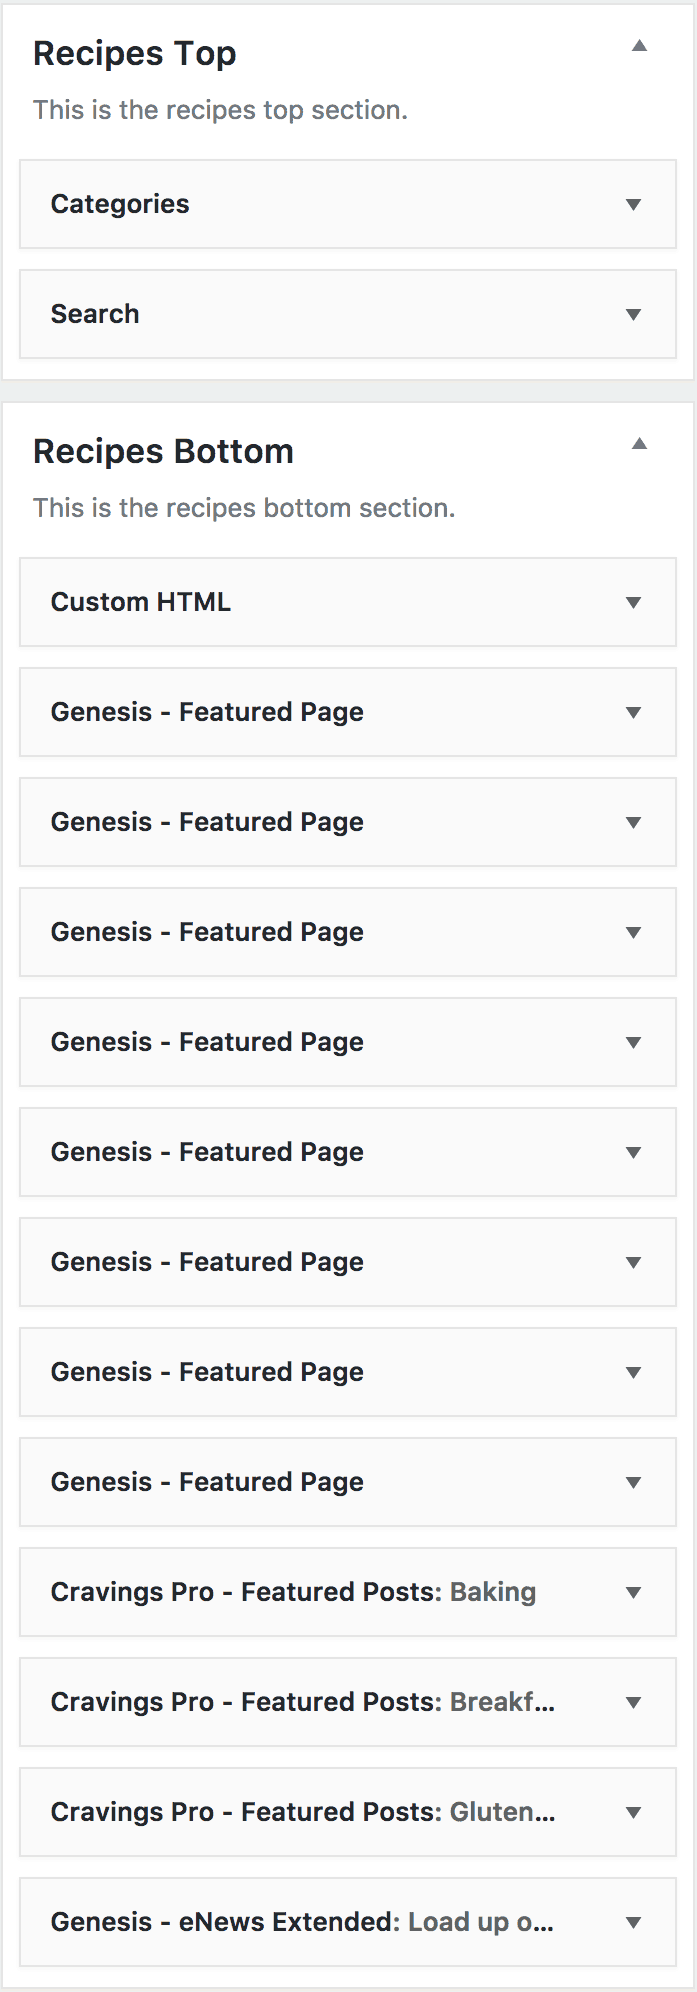 recipe index template koni polycode co